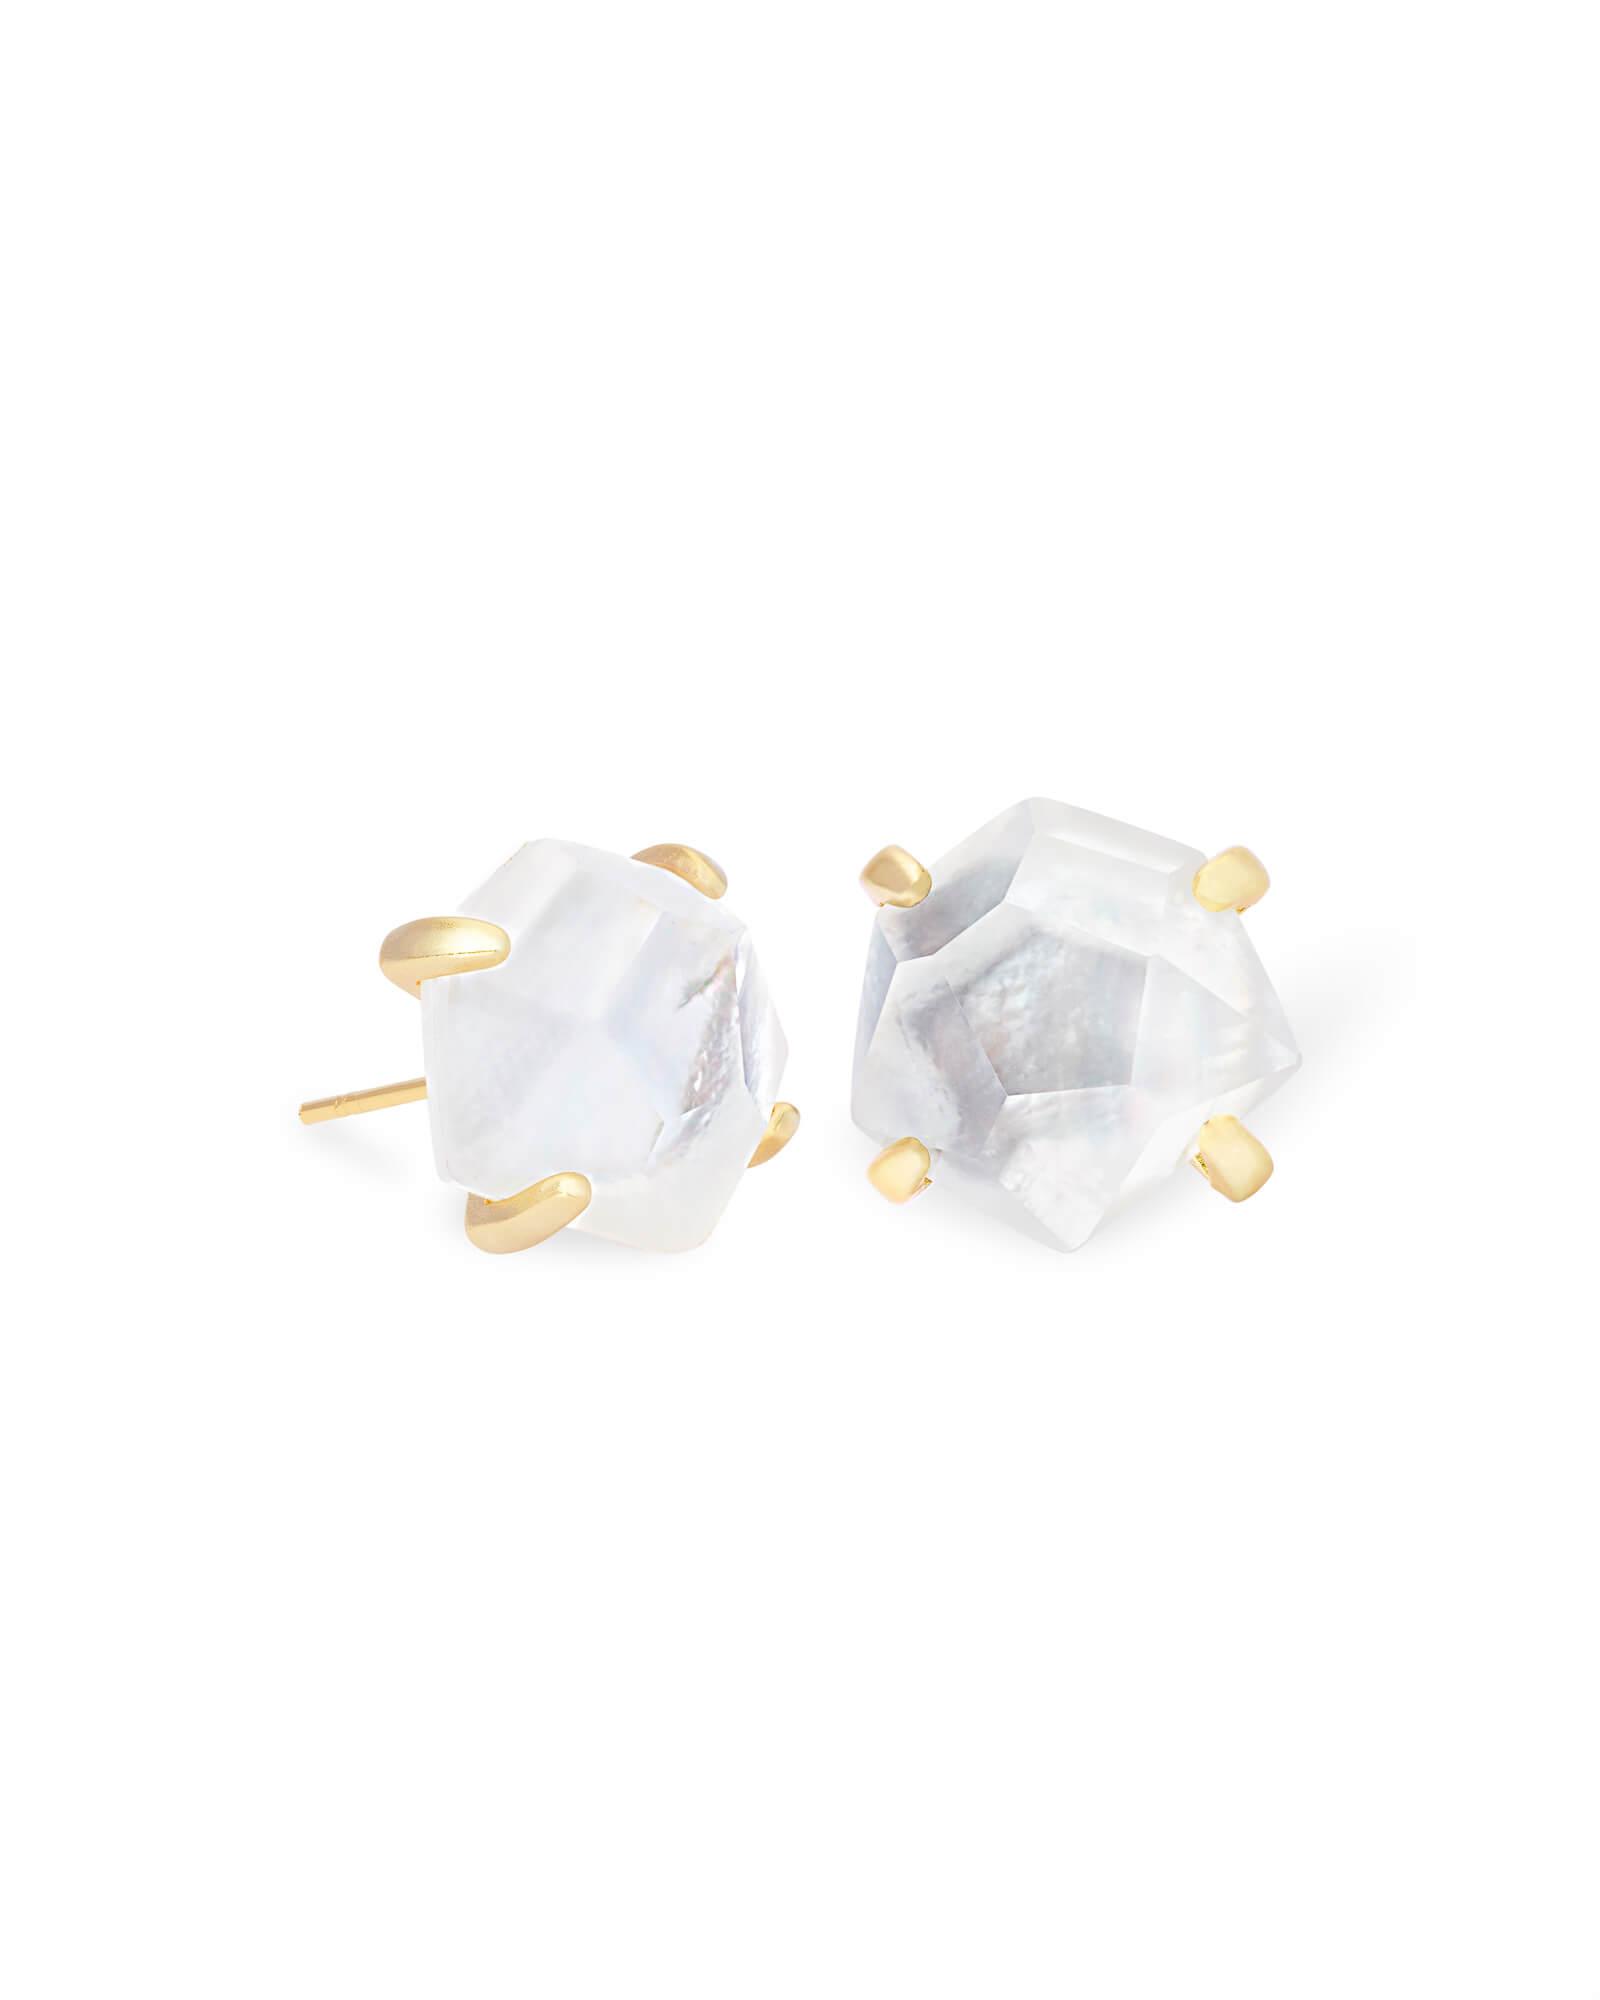 Ivory Mother Of Pearl Floor Vase In 2019: Ellms Gold Stud Earrings In Ivory Mother-of-Pearl